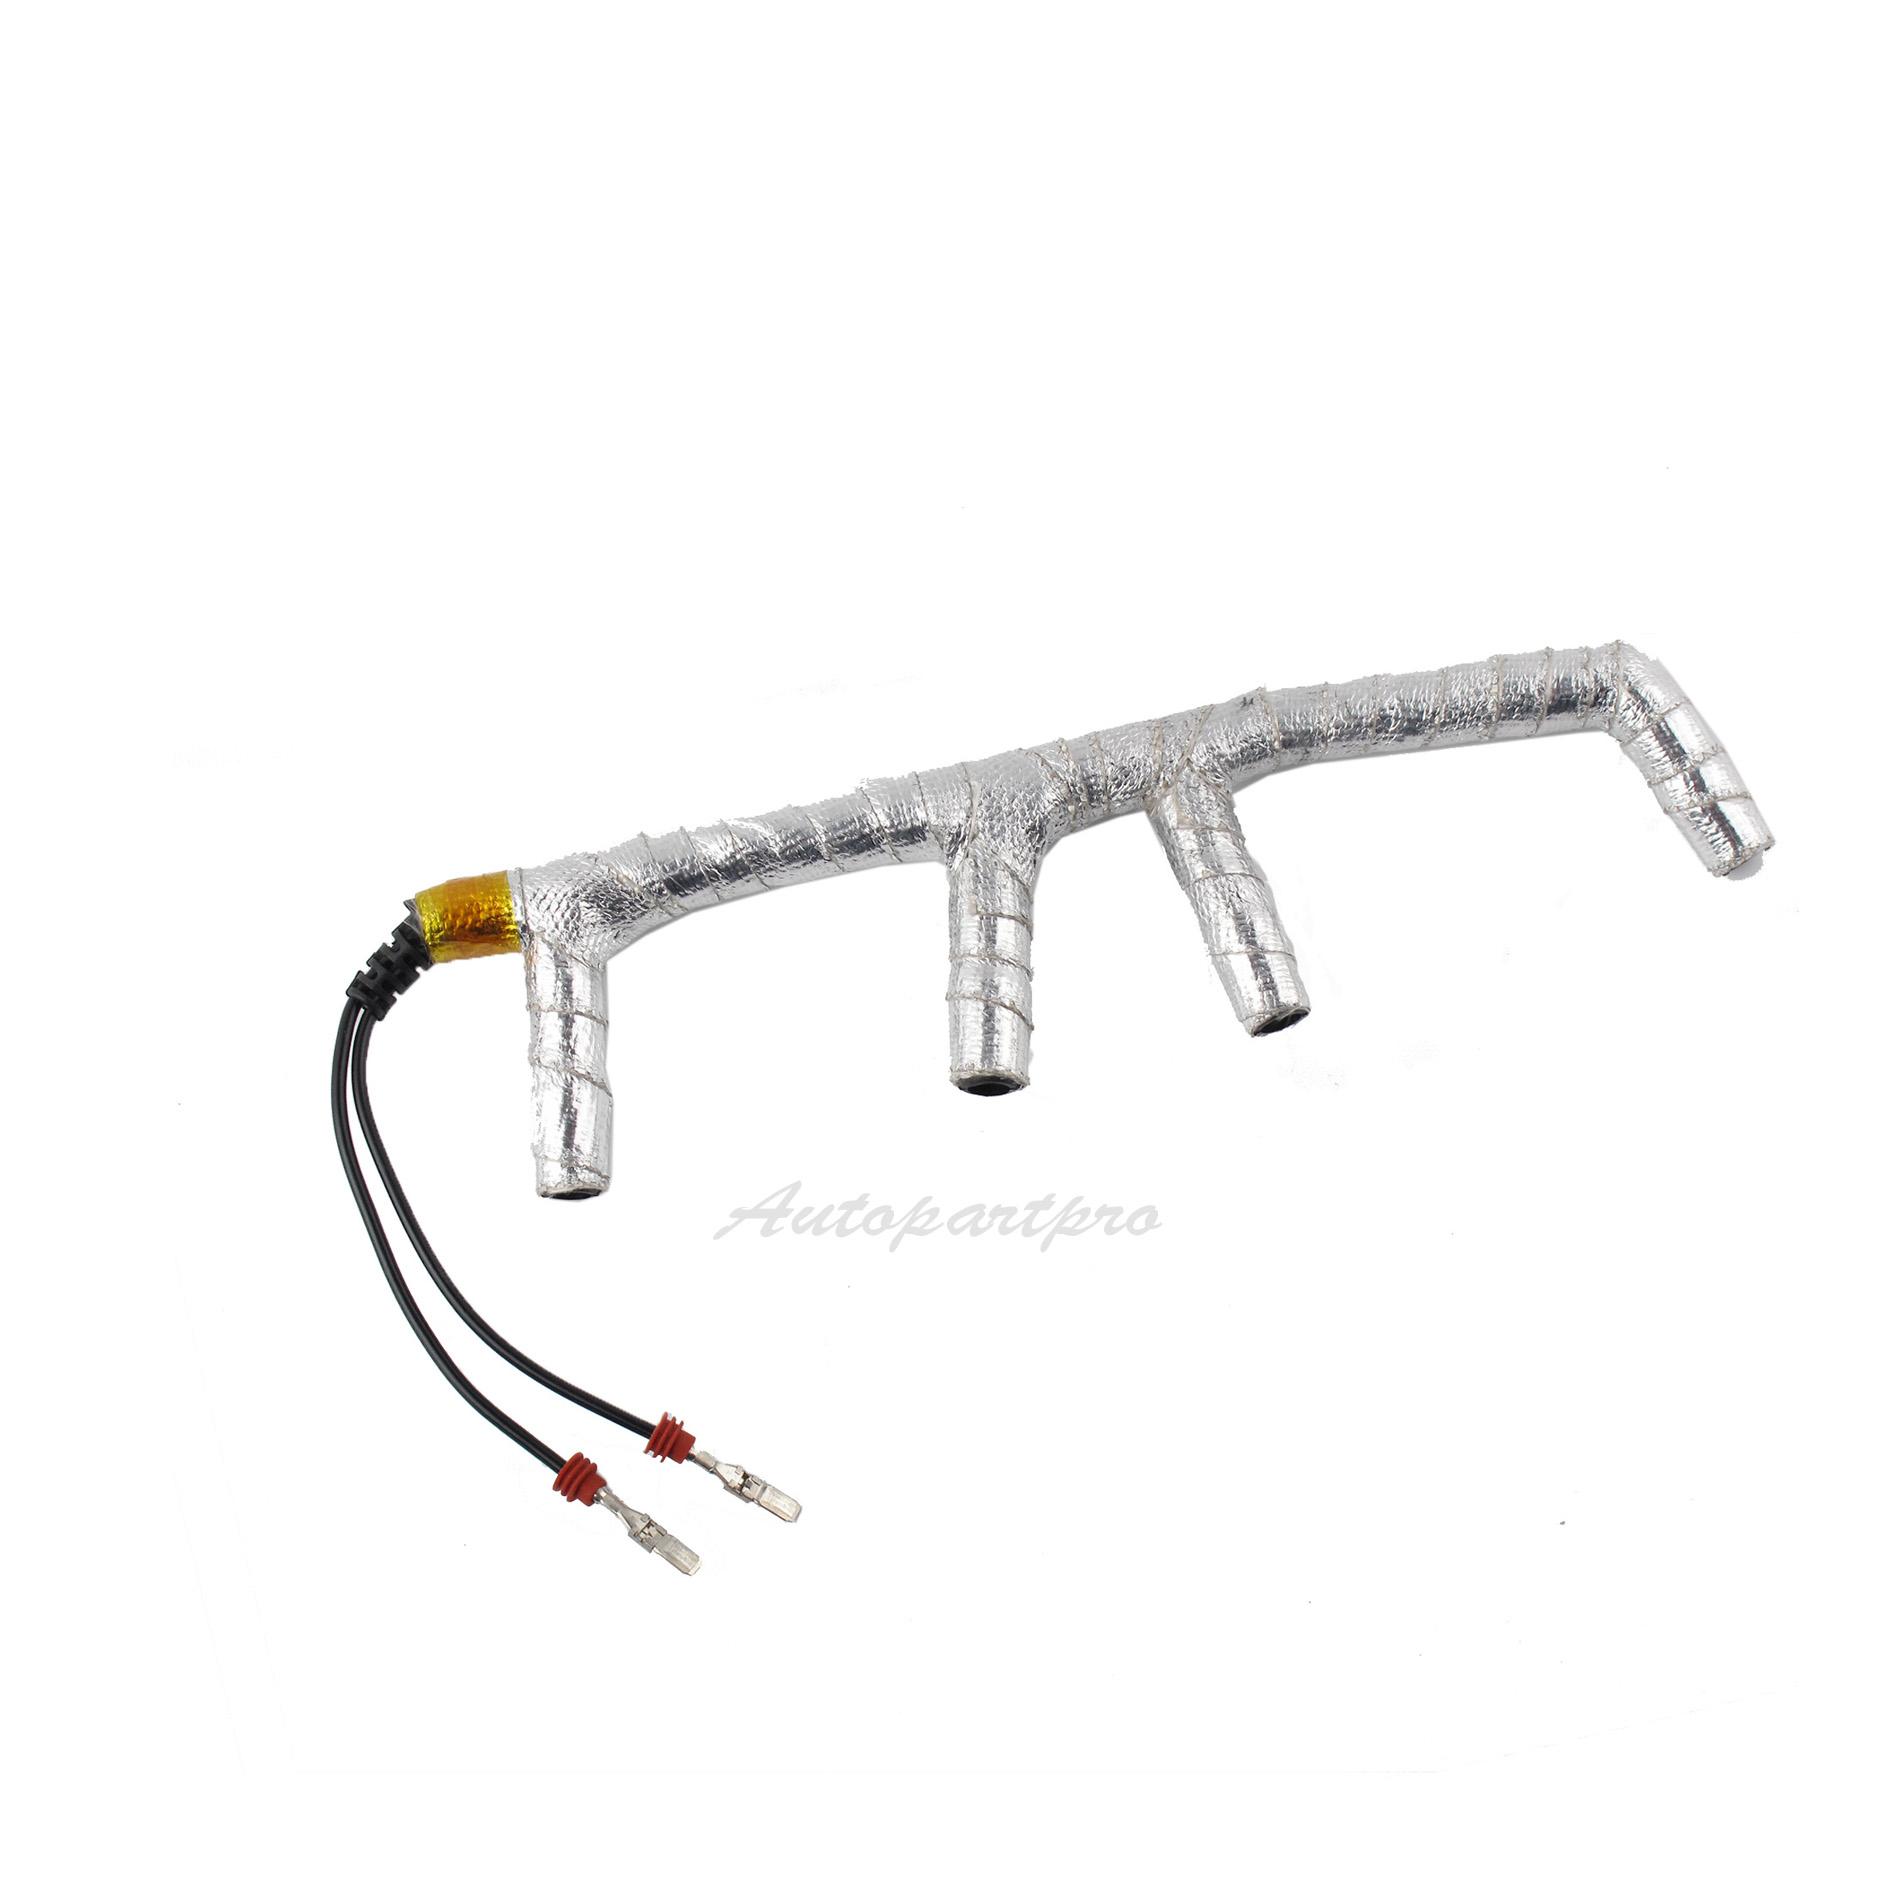 For VW Beetle 1.9L 2 Wire Glow Plug Wiring Harness W